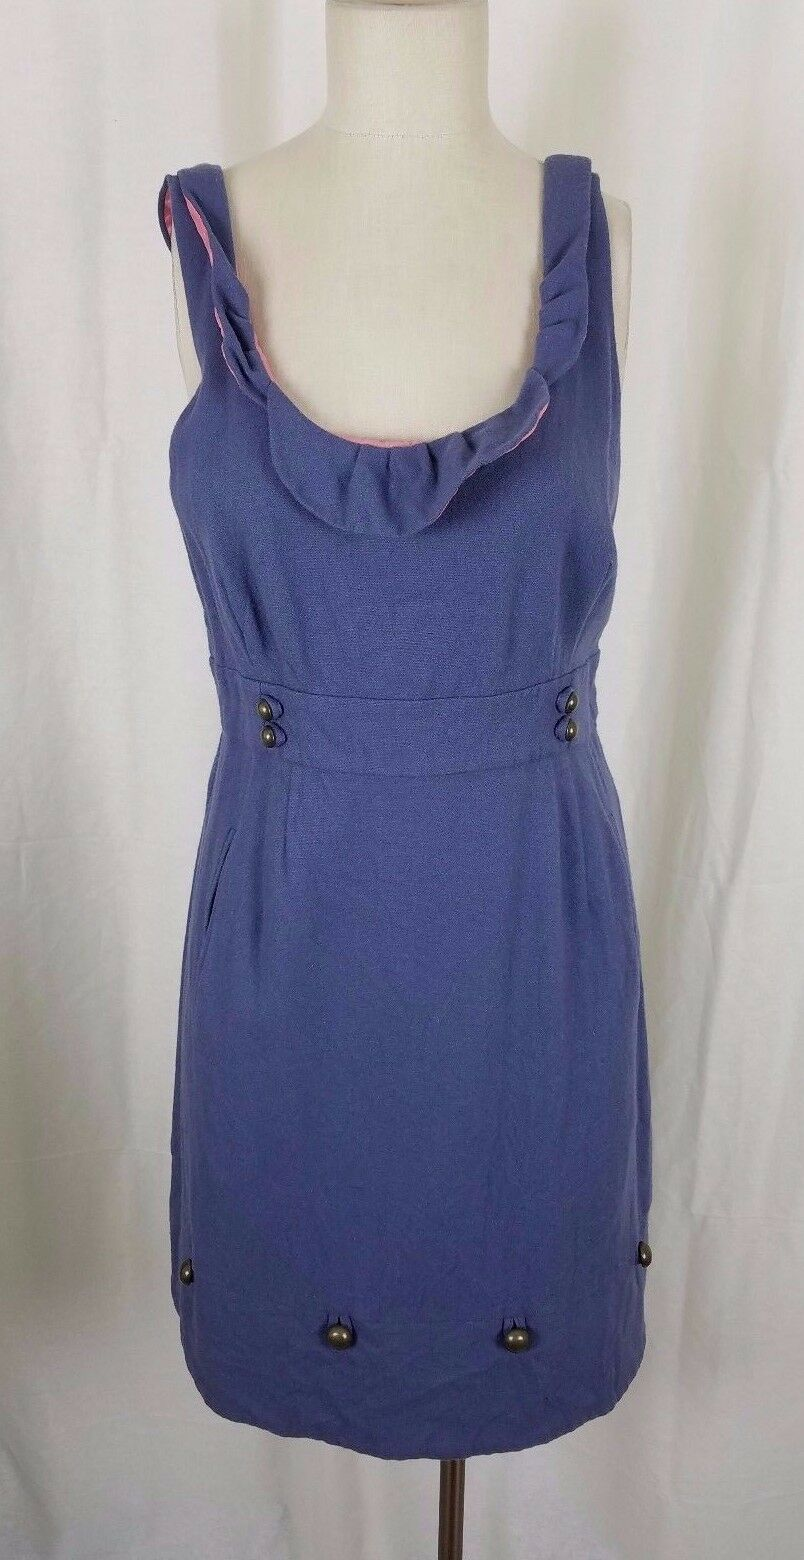 Anthropologie Moulinette Soeurs Familiar Orte Wolle Lavendel Blaues Kleid 12